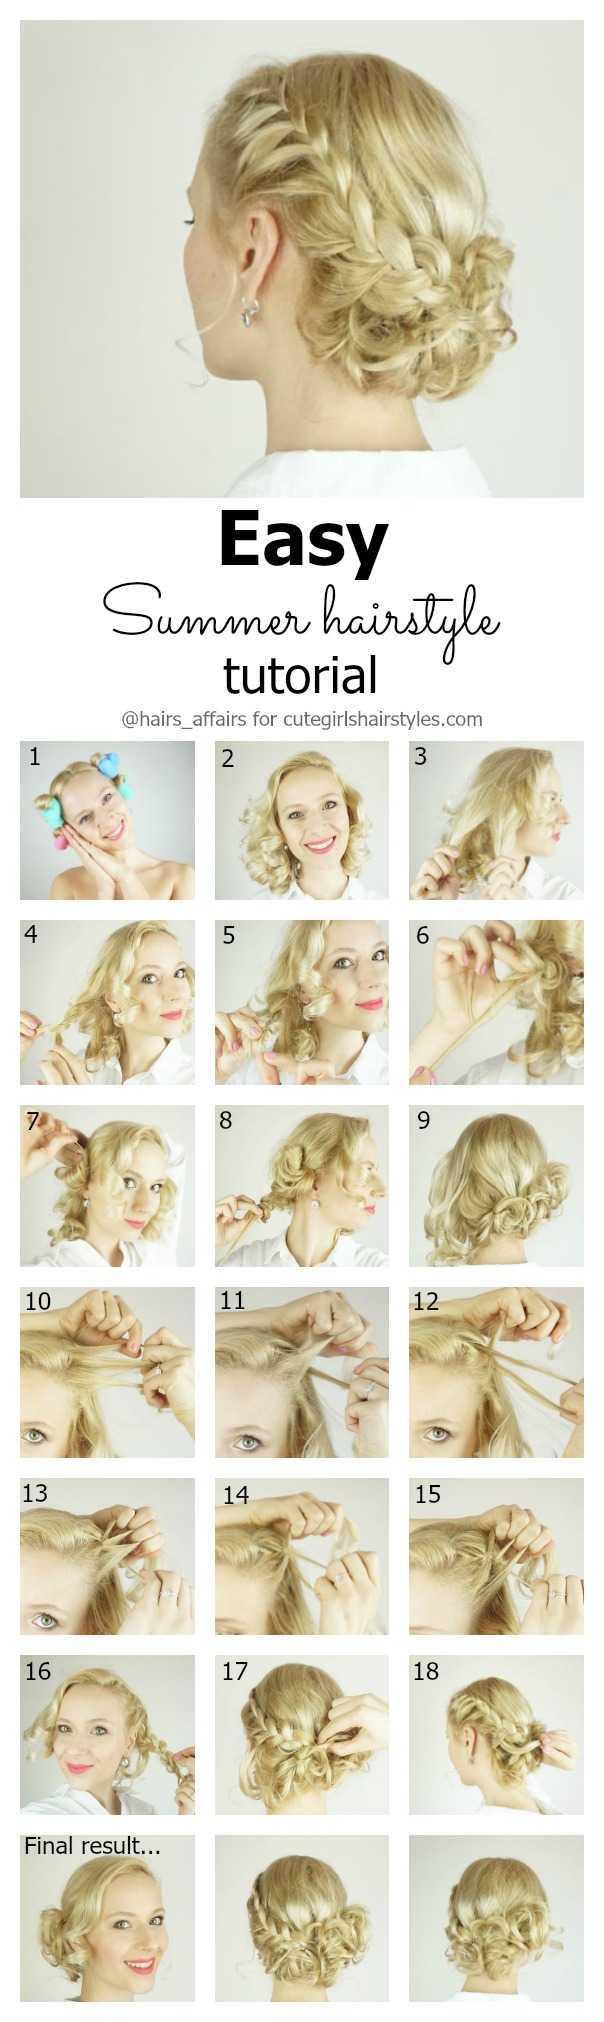 peinado sencillo tutorial verano